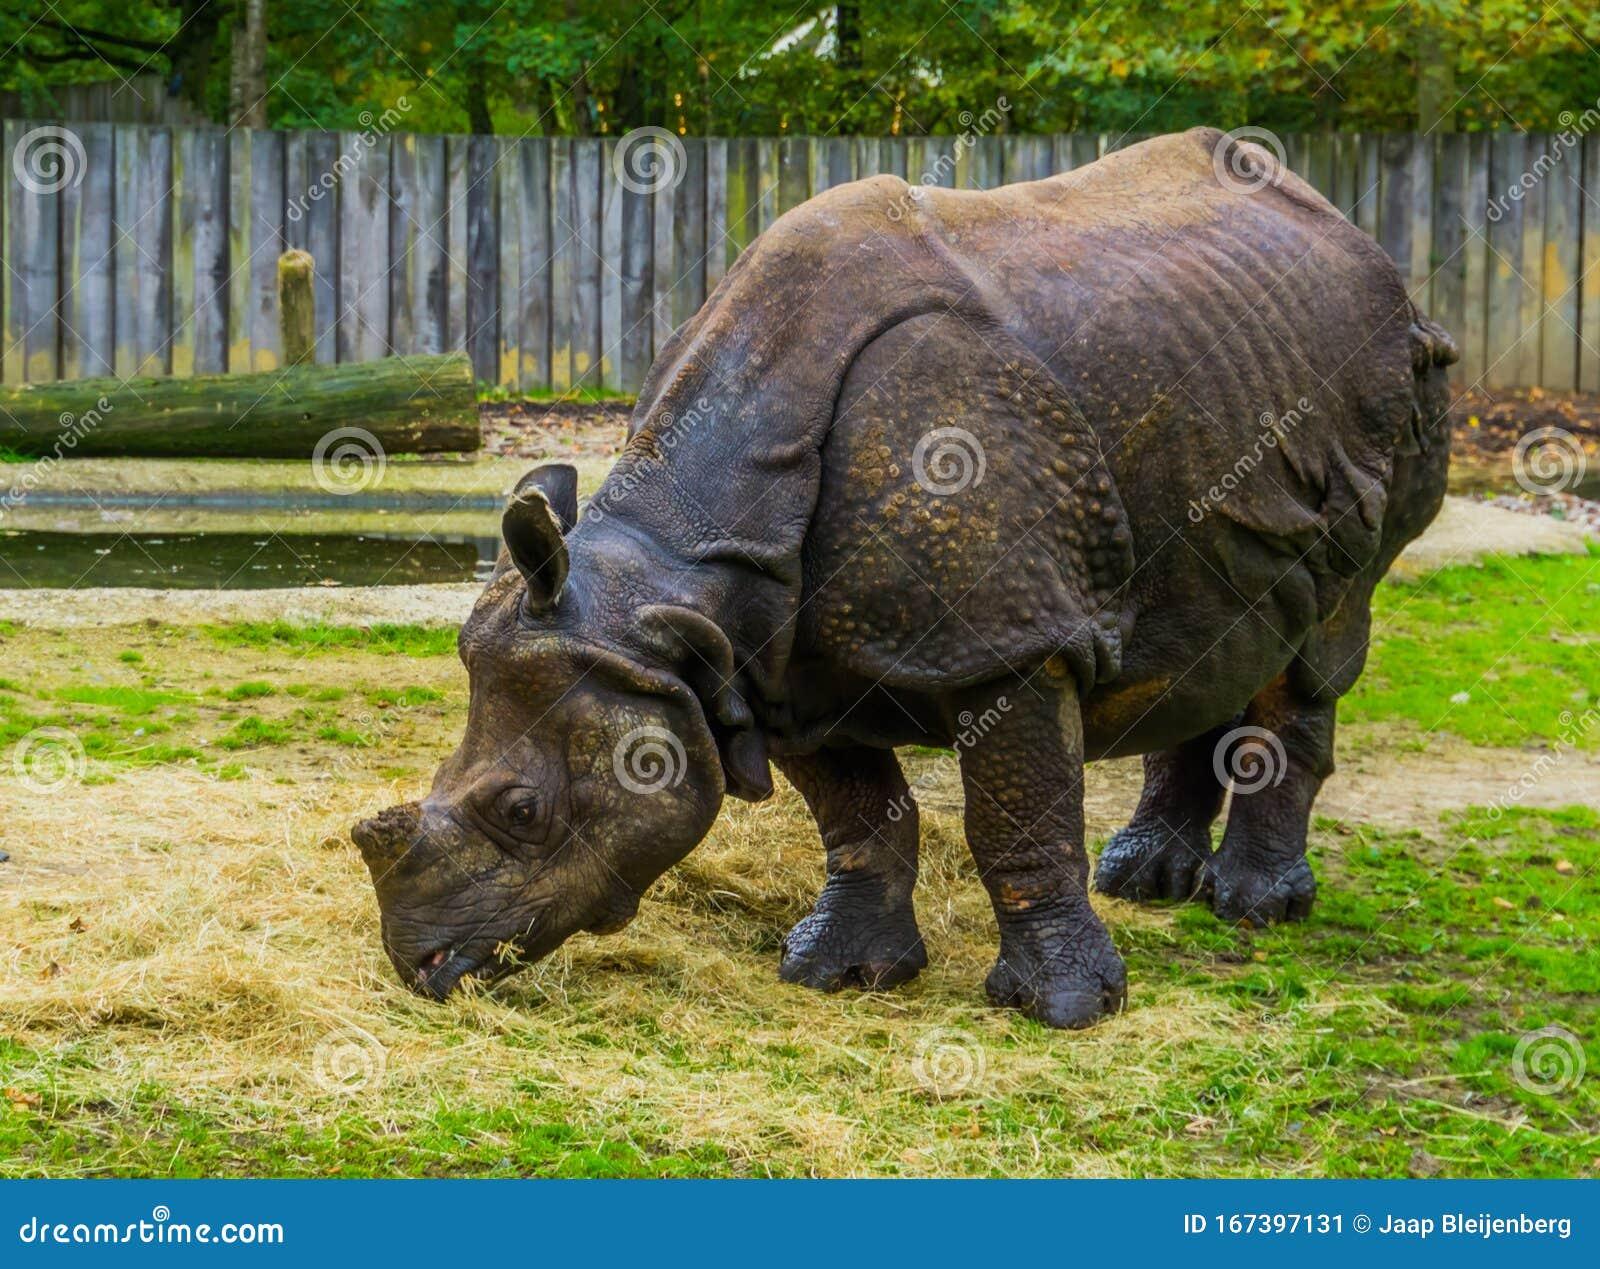 Great Indian Rhinoceros Eating Hay, Diet Of A Rhino ...